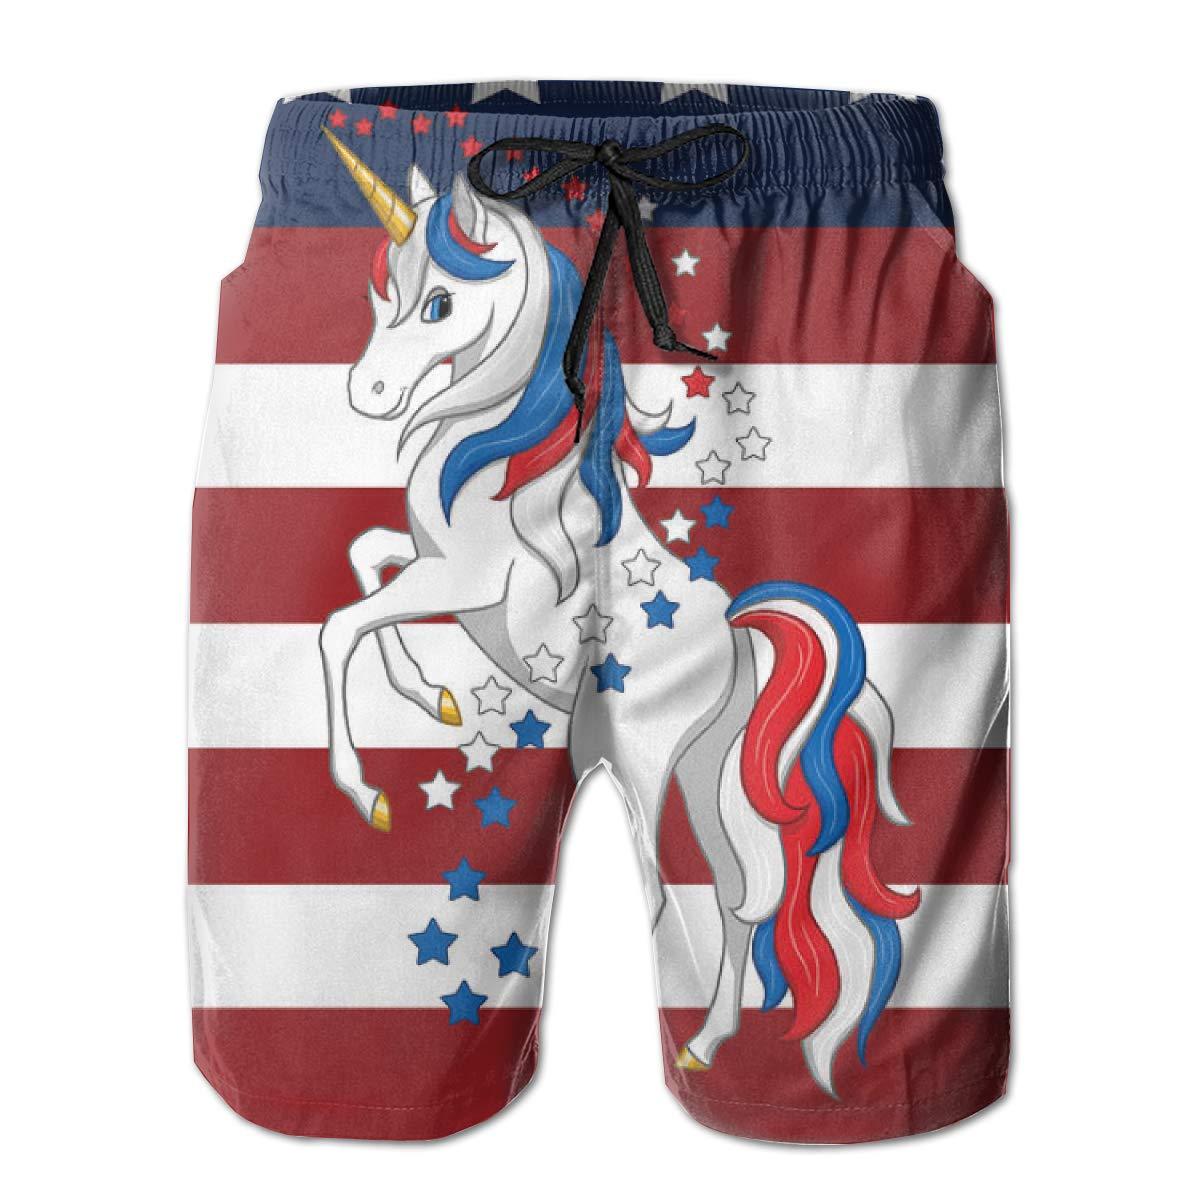 Mens Swim Trunks with Mesh Lining Pockets American Flag Unicorn Boys Polyester Board Shorts Swimwear